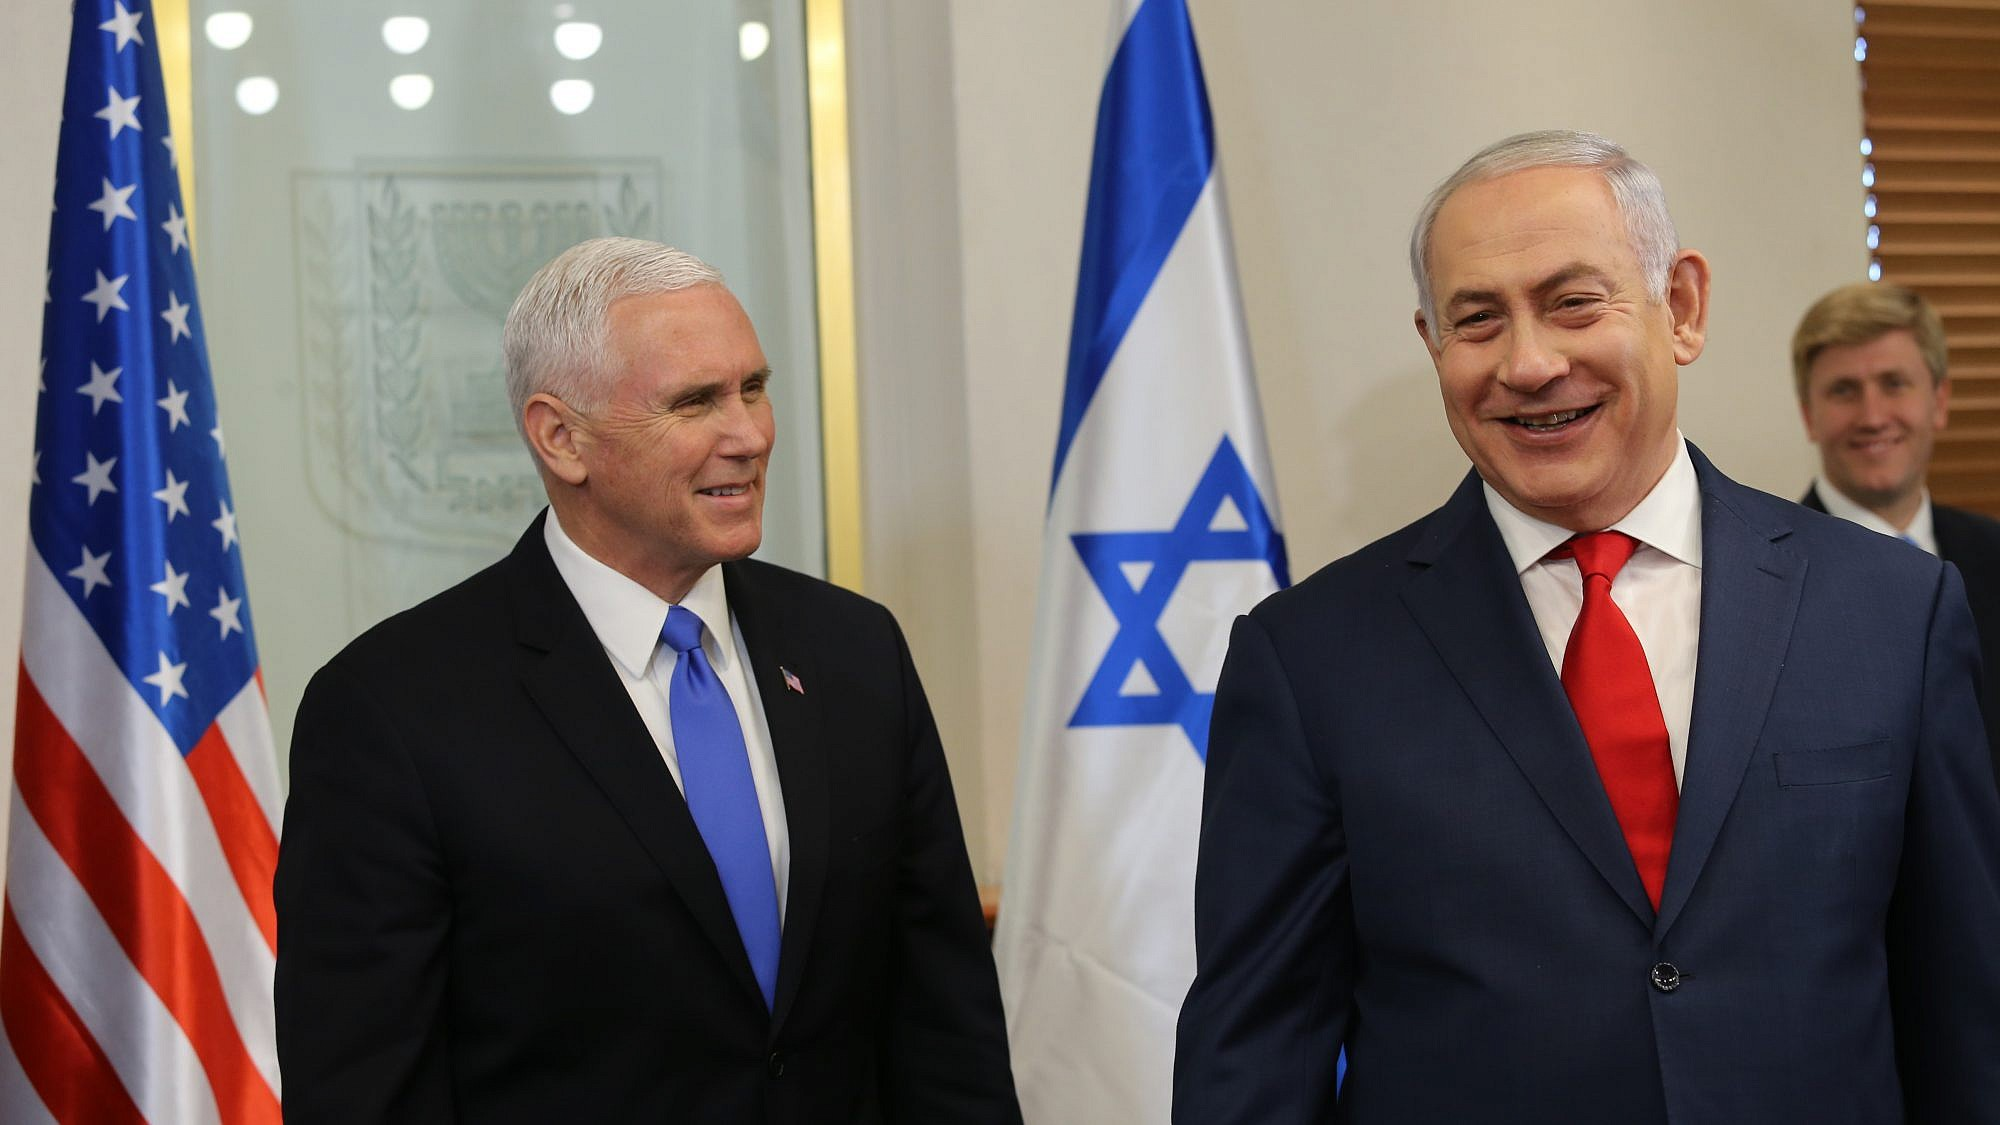 Vice President Mike Pence is welcomed by Israeli Prime Minister Benjamin Netanyahu at the Prime Minister's Office in Jerusalem on January 22, 2018. Credit: Alex Kolomoisky/POOL/Flash90.